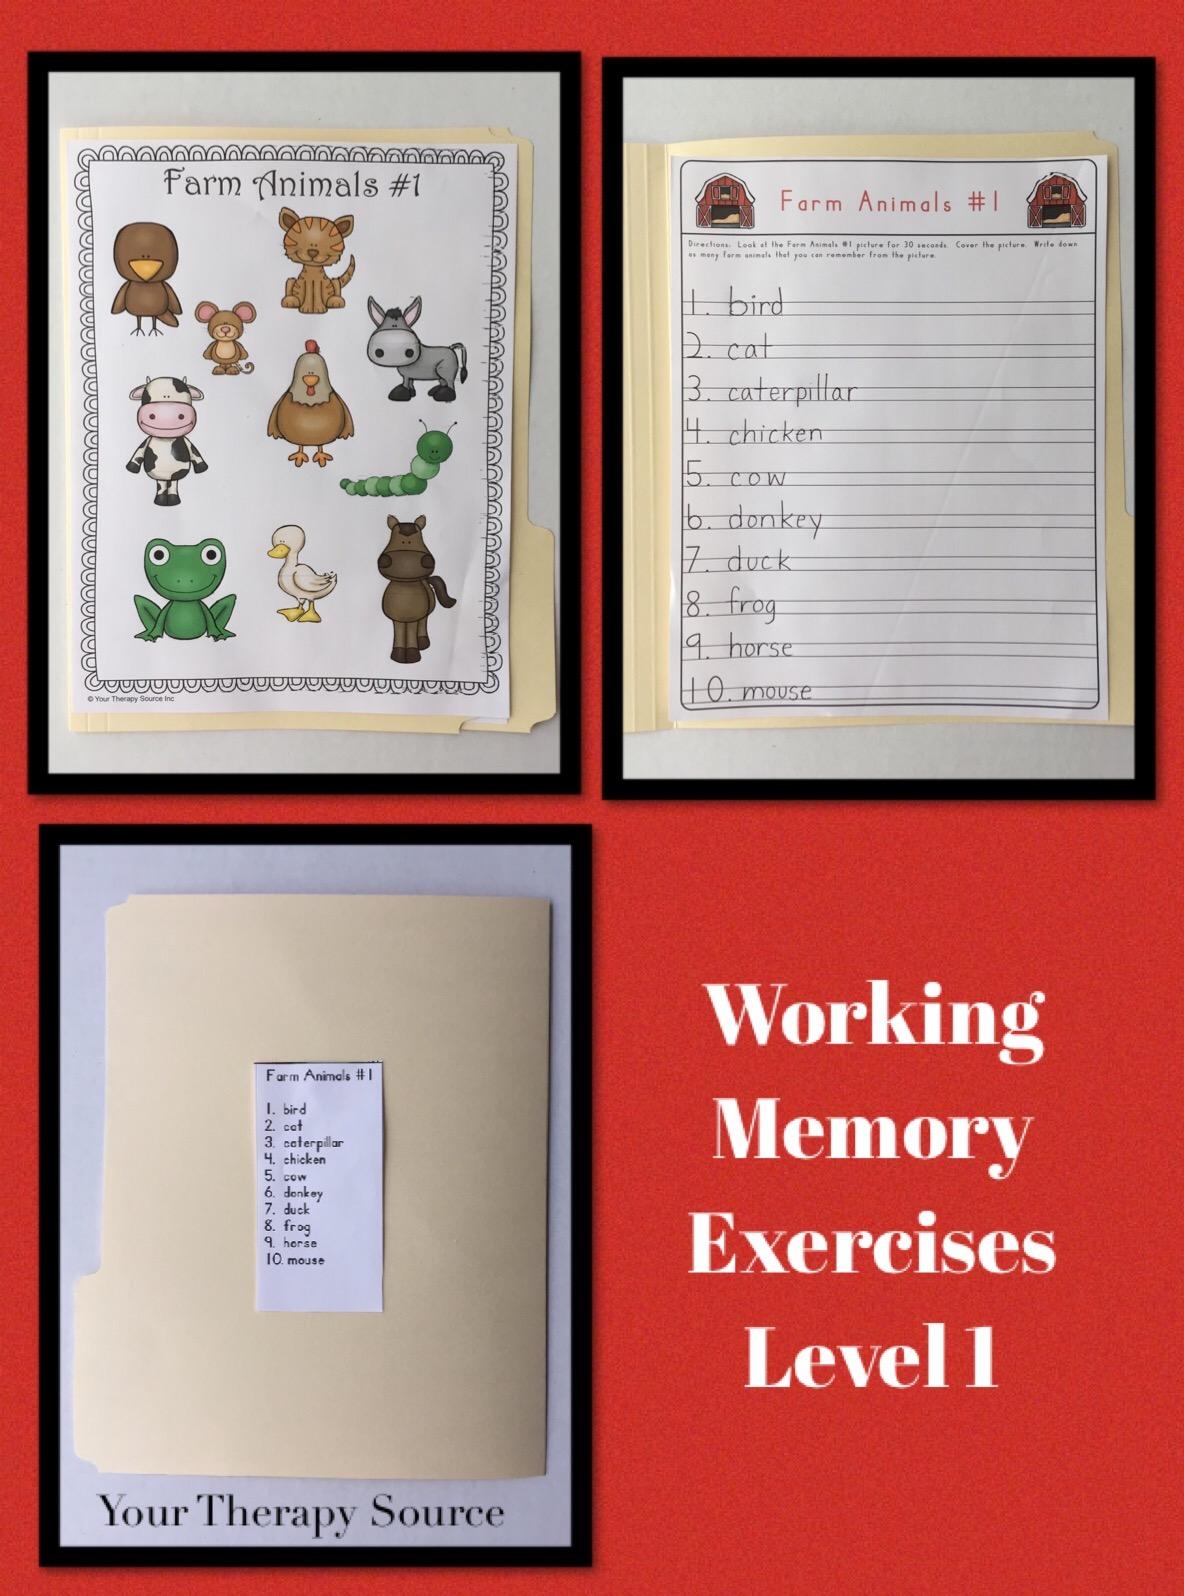 Working Memory Exercises